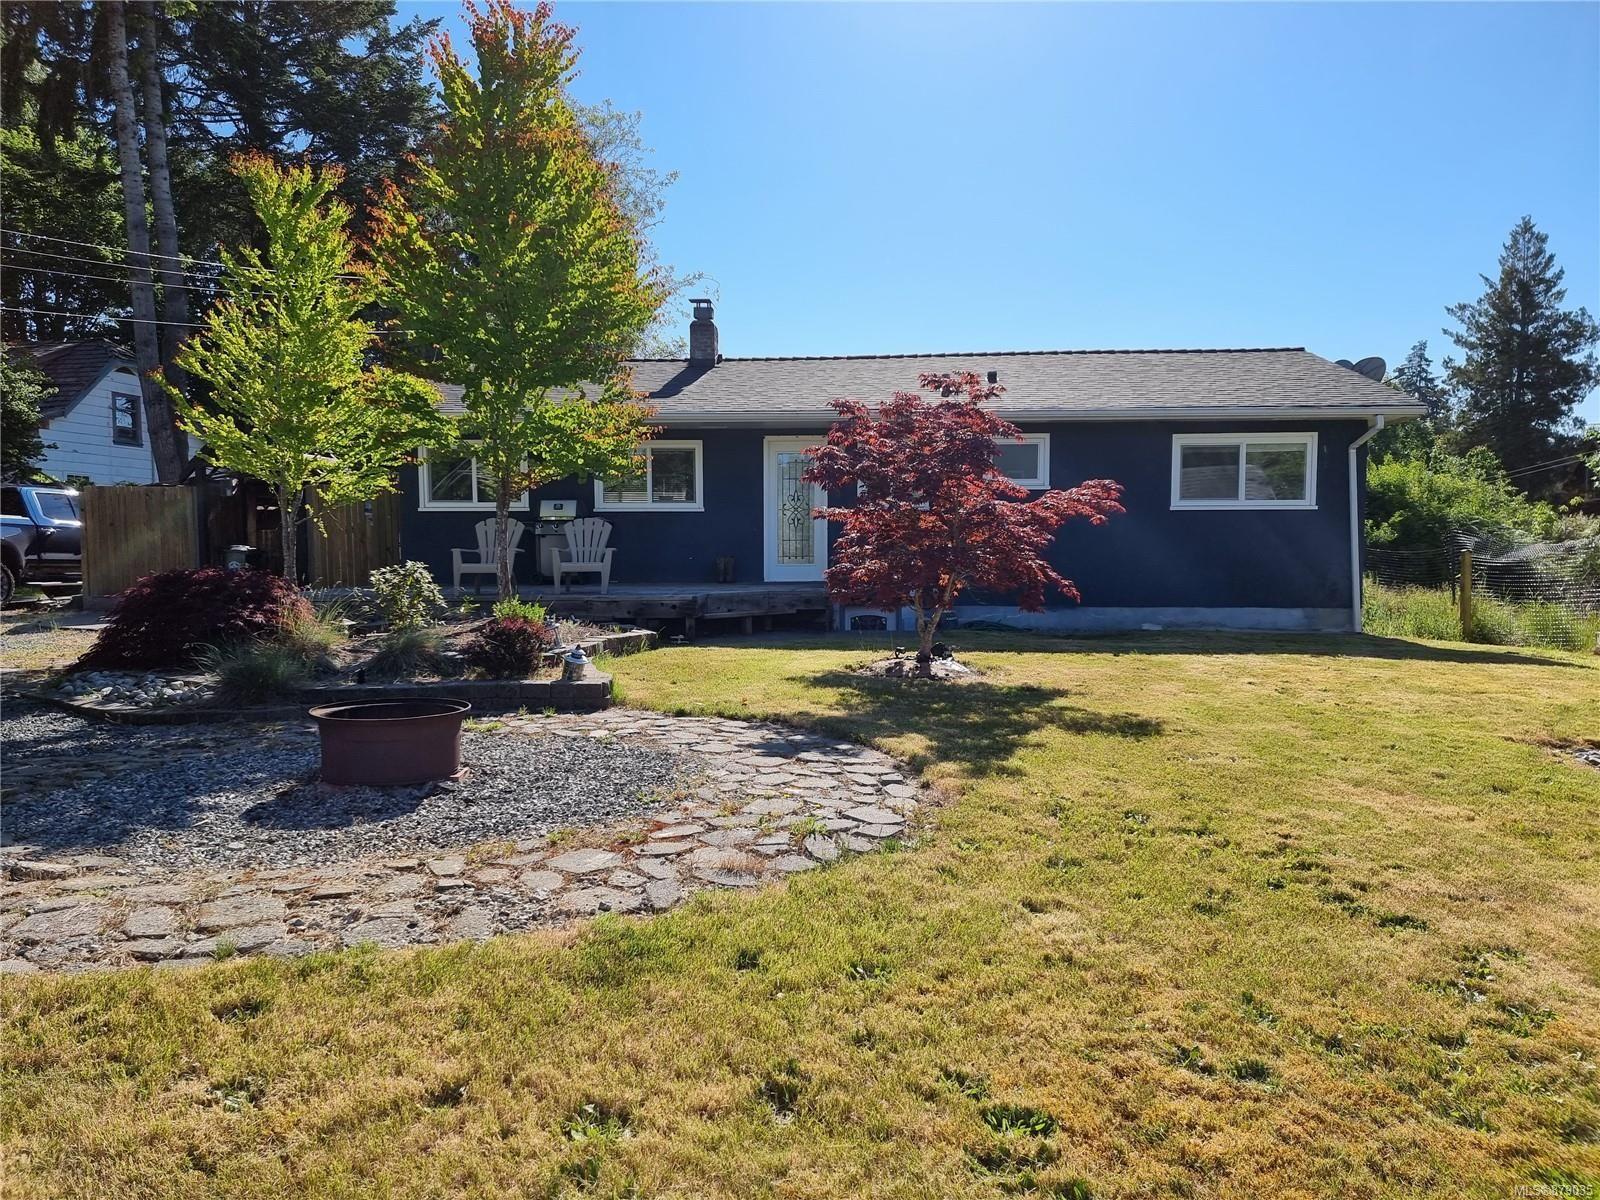 Main Photo: 5174 Cleary Rd in : PA Port Alberni House for sale (Port Alberni)  : MLS®# 879035